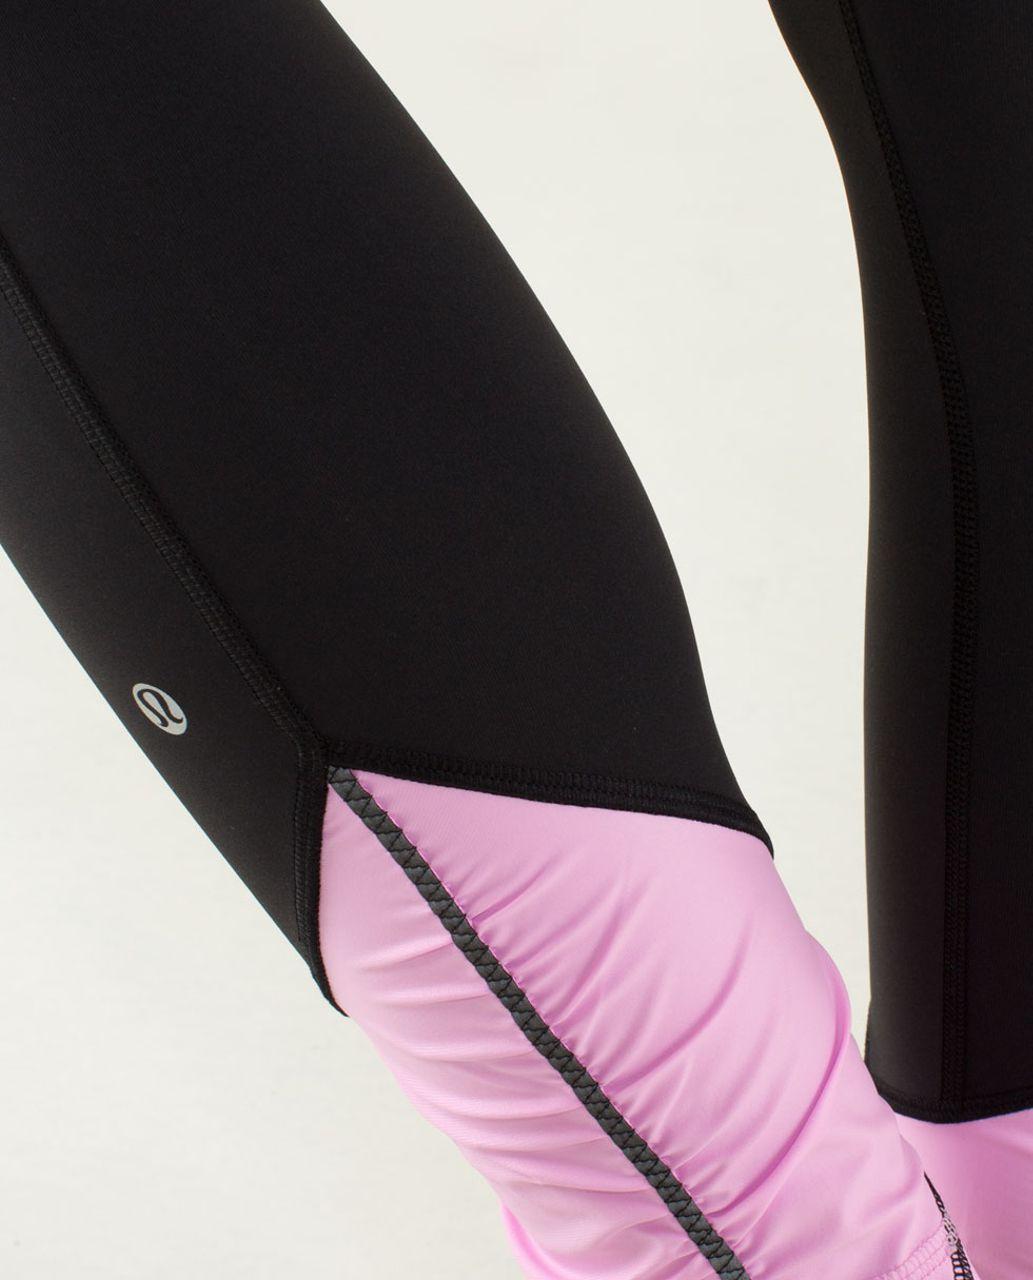 Lululemon Pace Queen Tight - Black / Vintage Pink